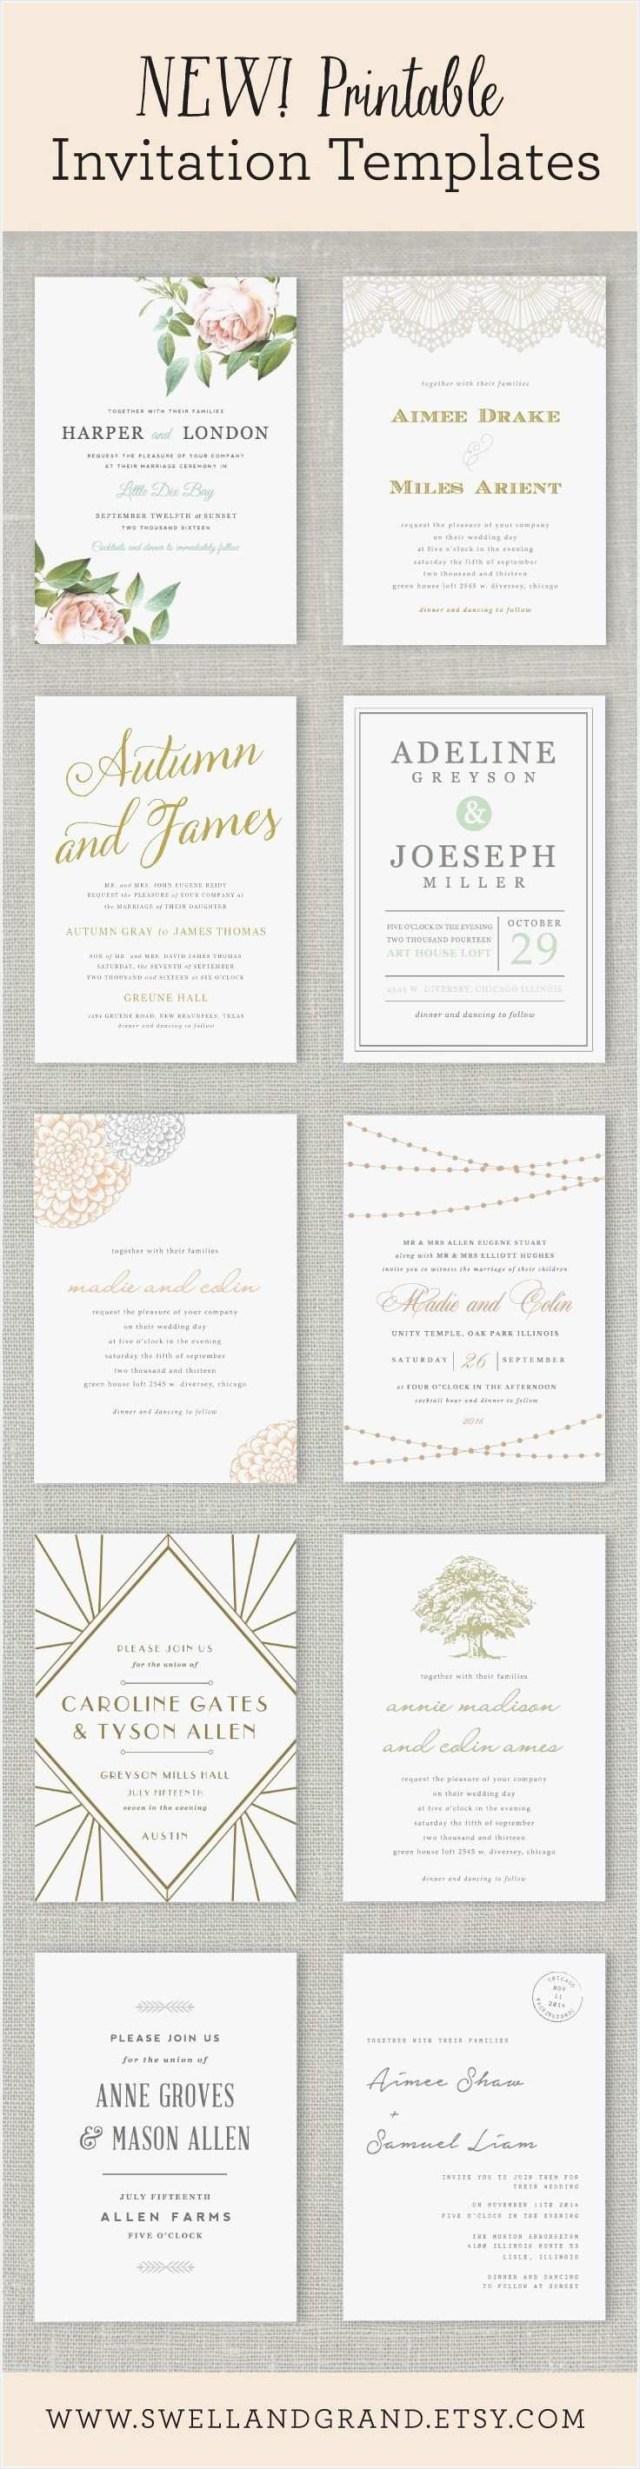 Free Printable Wedding Invitation Templates For Word 66 New Free Printable Wedding Invitations Templates Pictures Autos